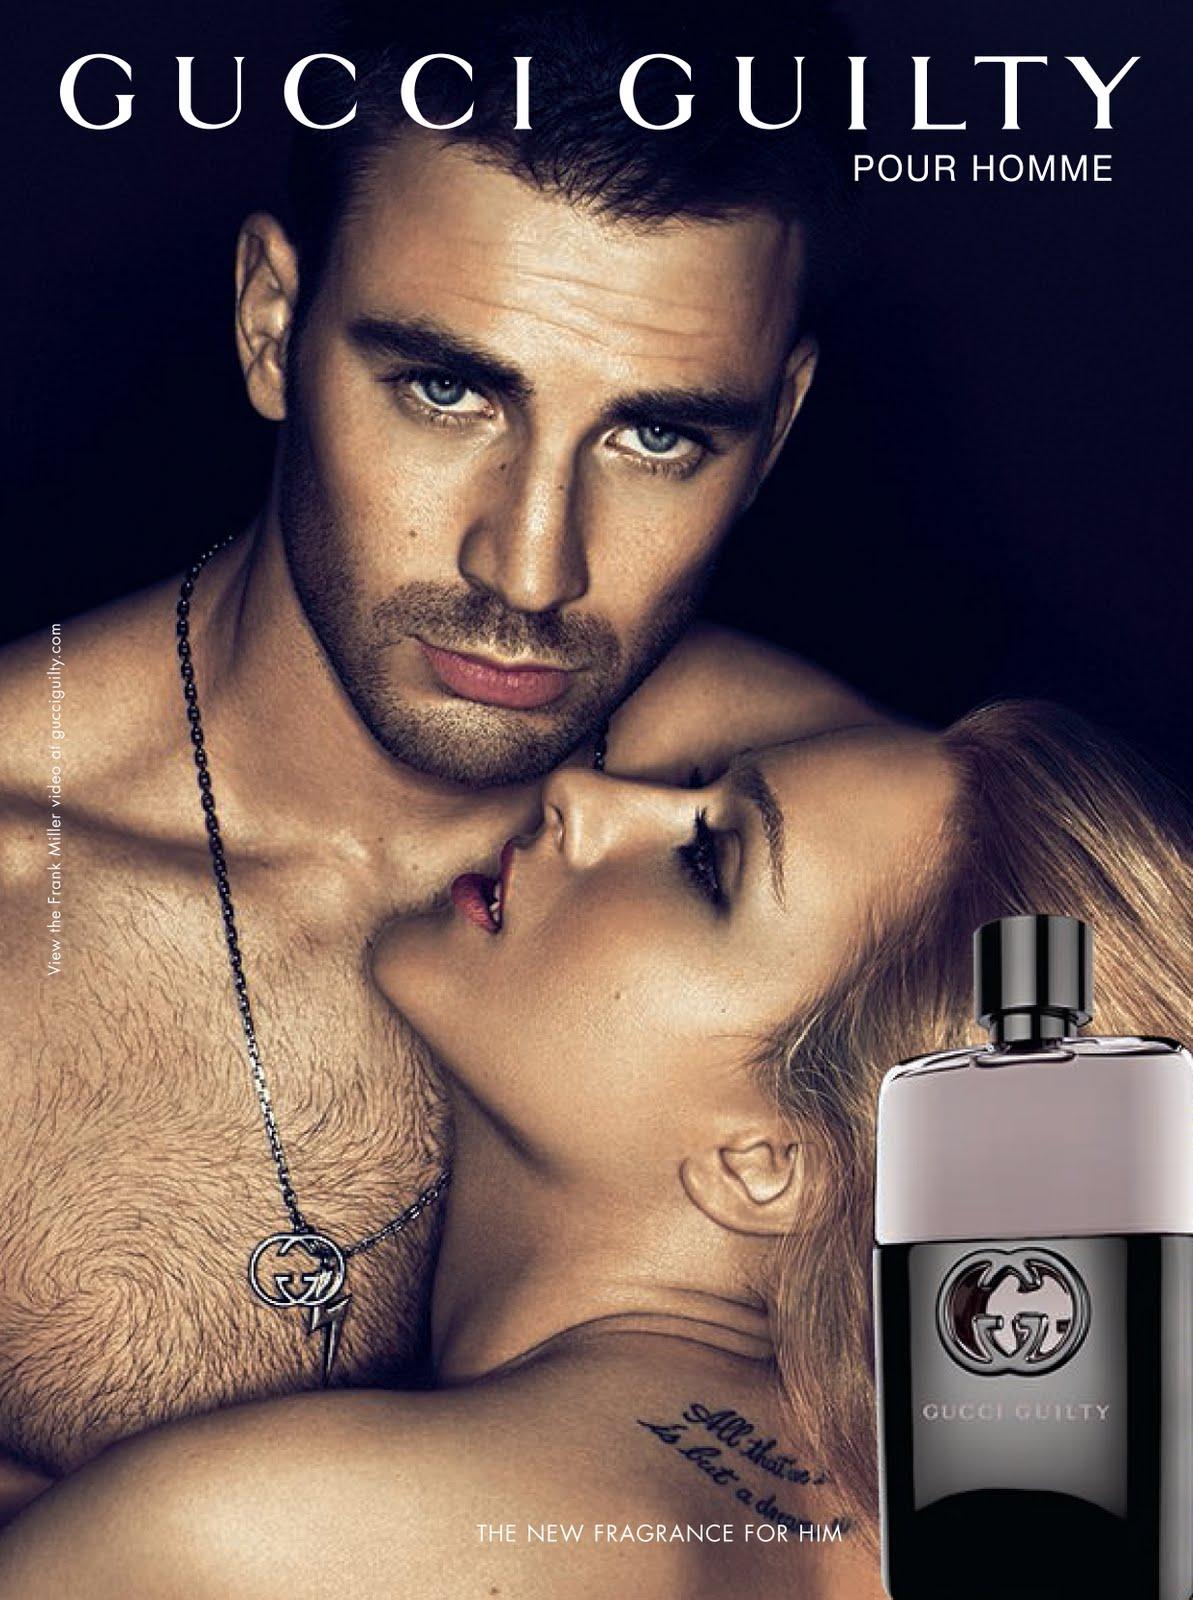 Scented Hound Tip – Perfumed Magazine Ads & Inserts